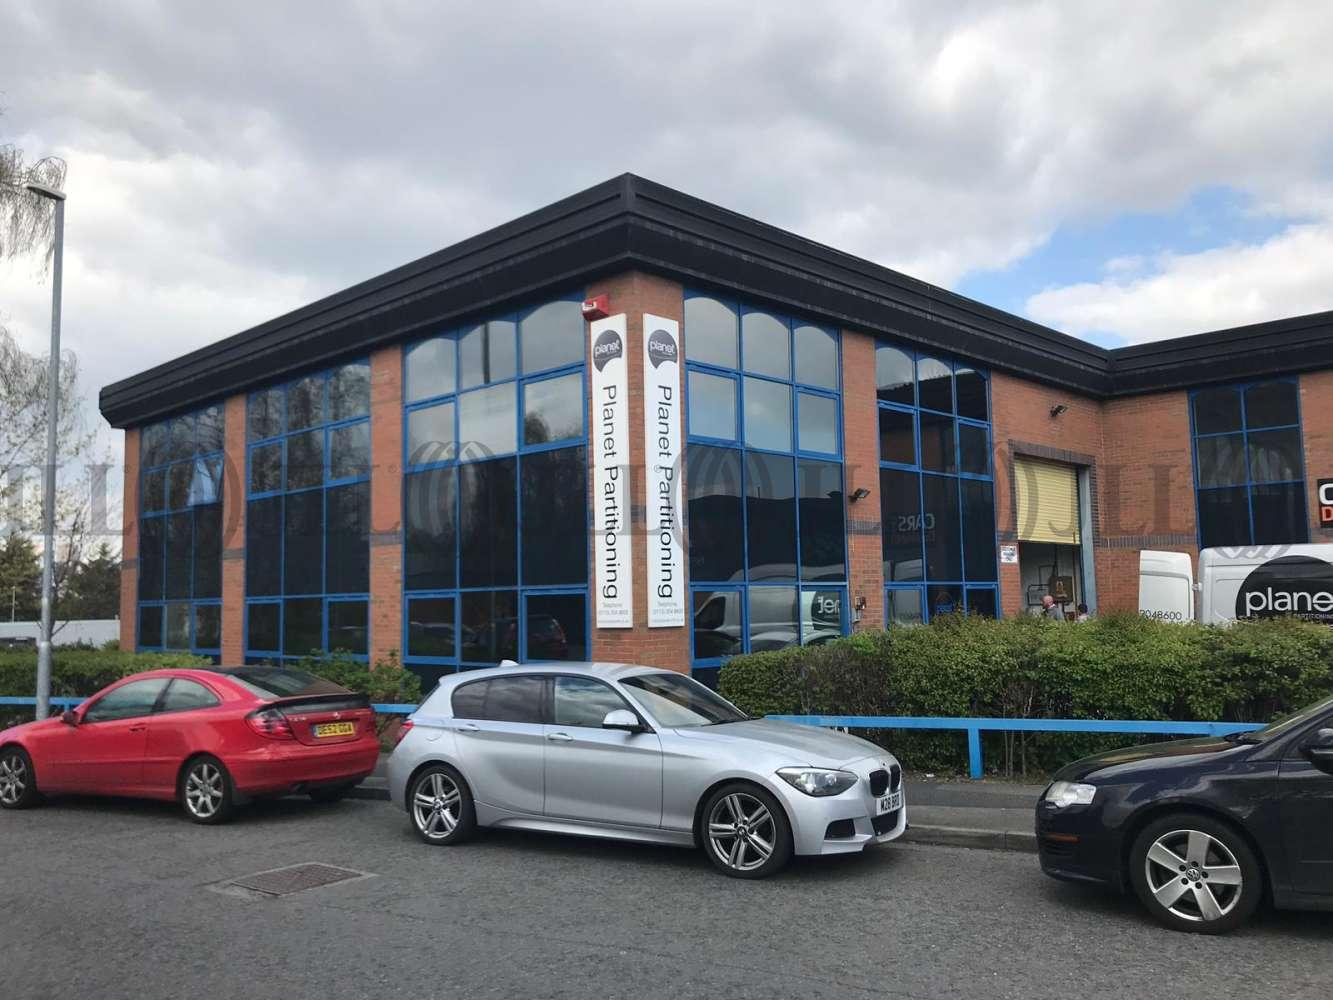 Industrial and logistics Leeds, LS11 5LN - Unit 3 Apex Business Park - 02